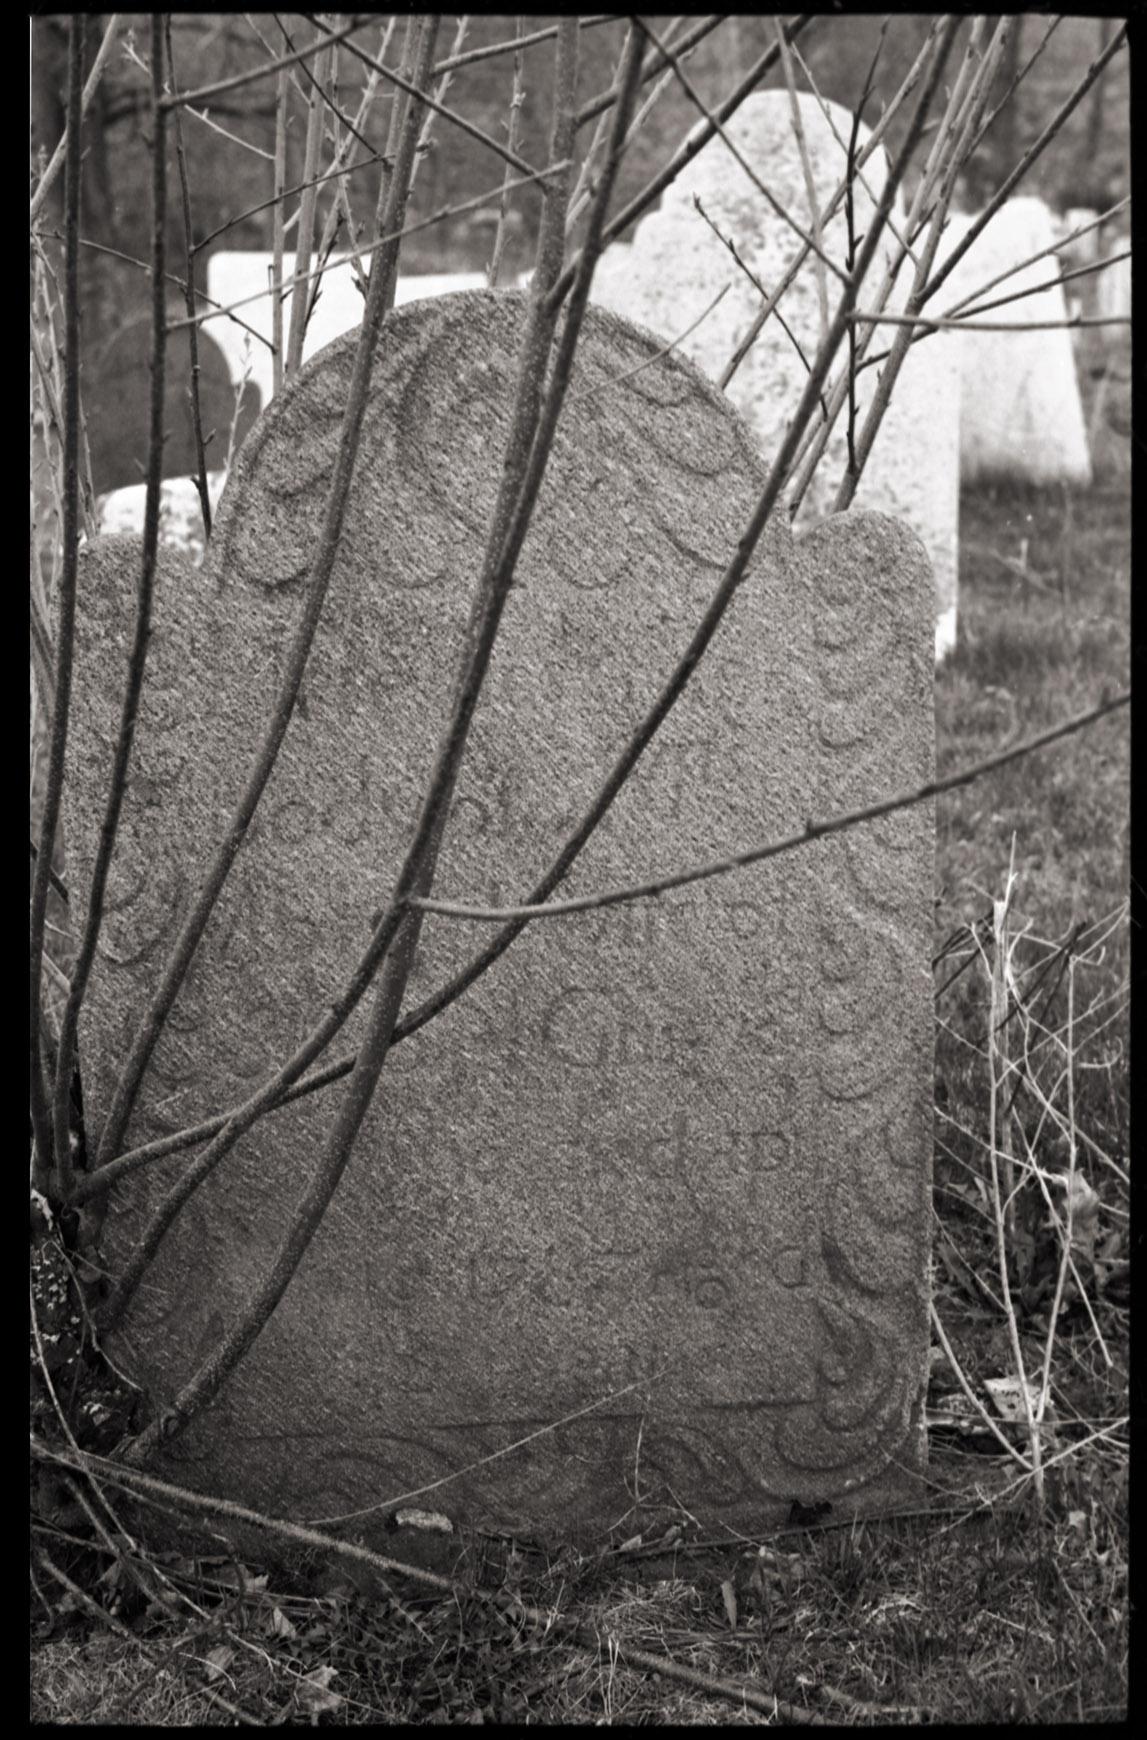 Depiction of Chapinville Cemetery, Salisbury, Conn., April 25, 1974